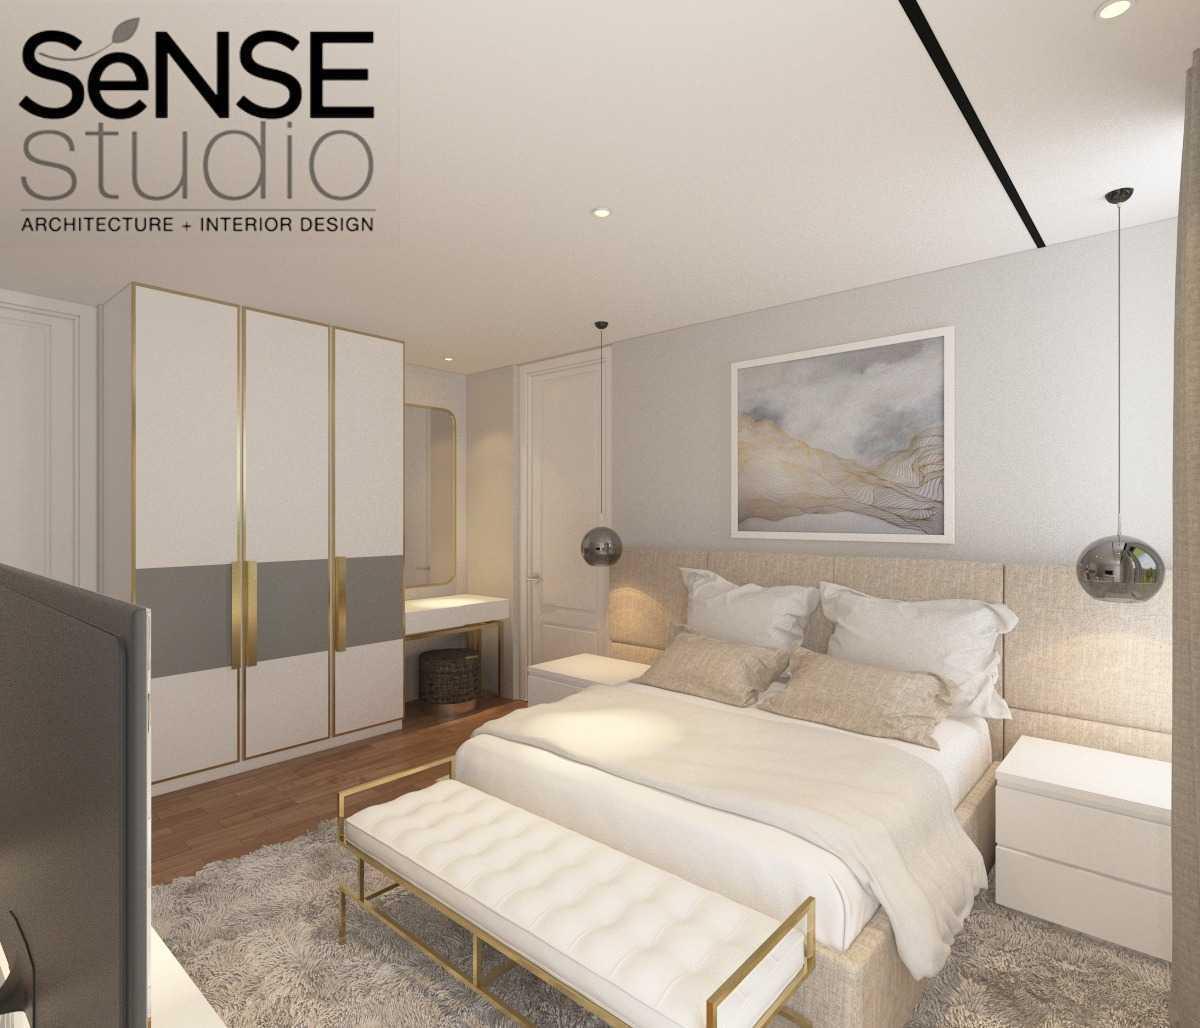 Sense Isle Studio Residence Surabaya Surabaya, Kota Sby, Jawa Timur, Indonesia Surabaya, Kota Sby, Jawa Timur, Indonesia Sense-Studio-Residence-Surabaya  80435